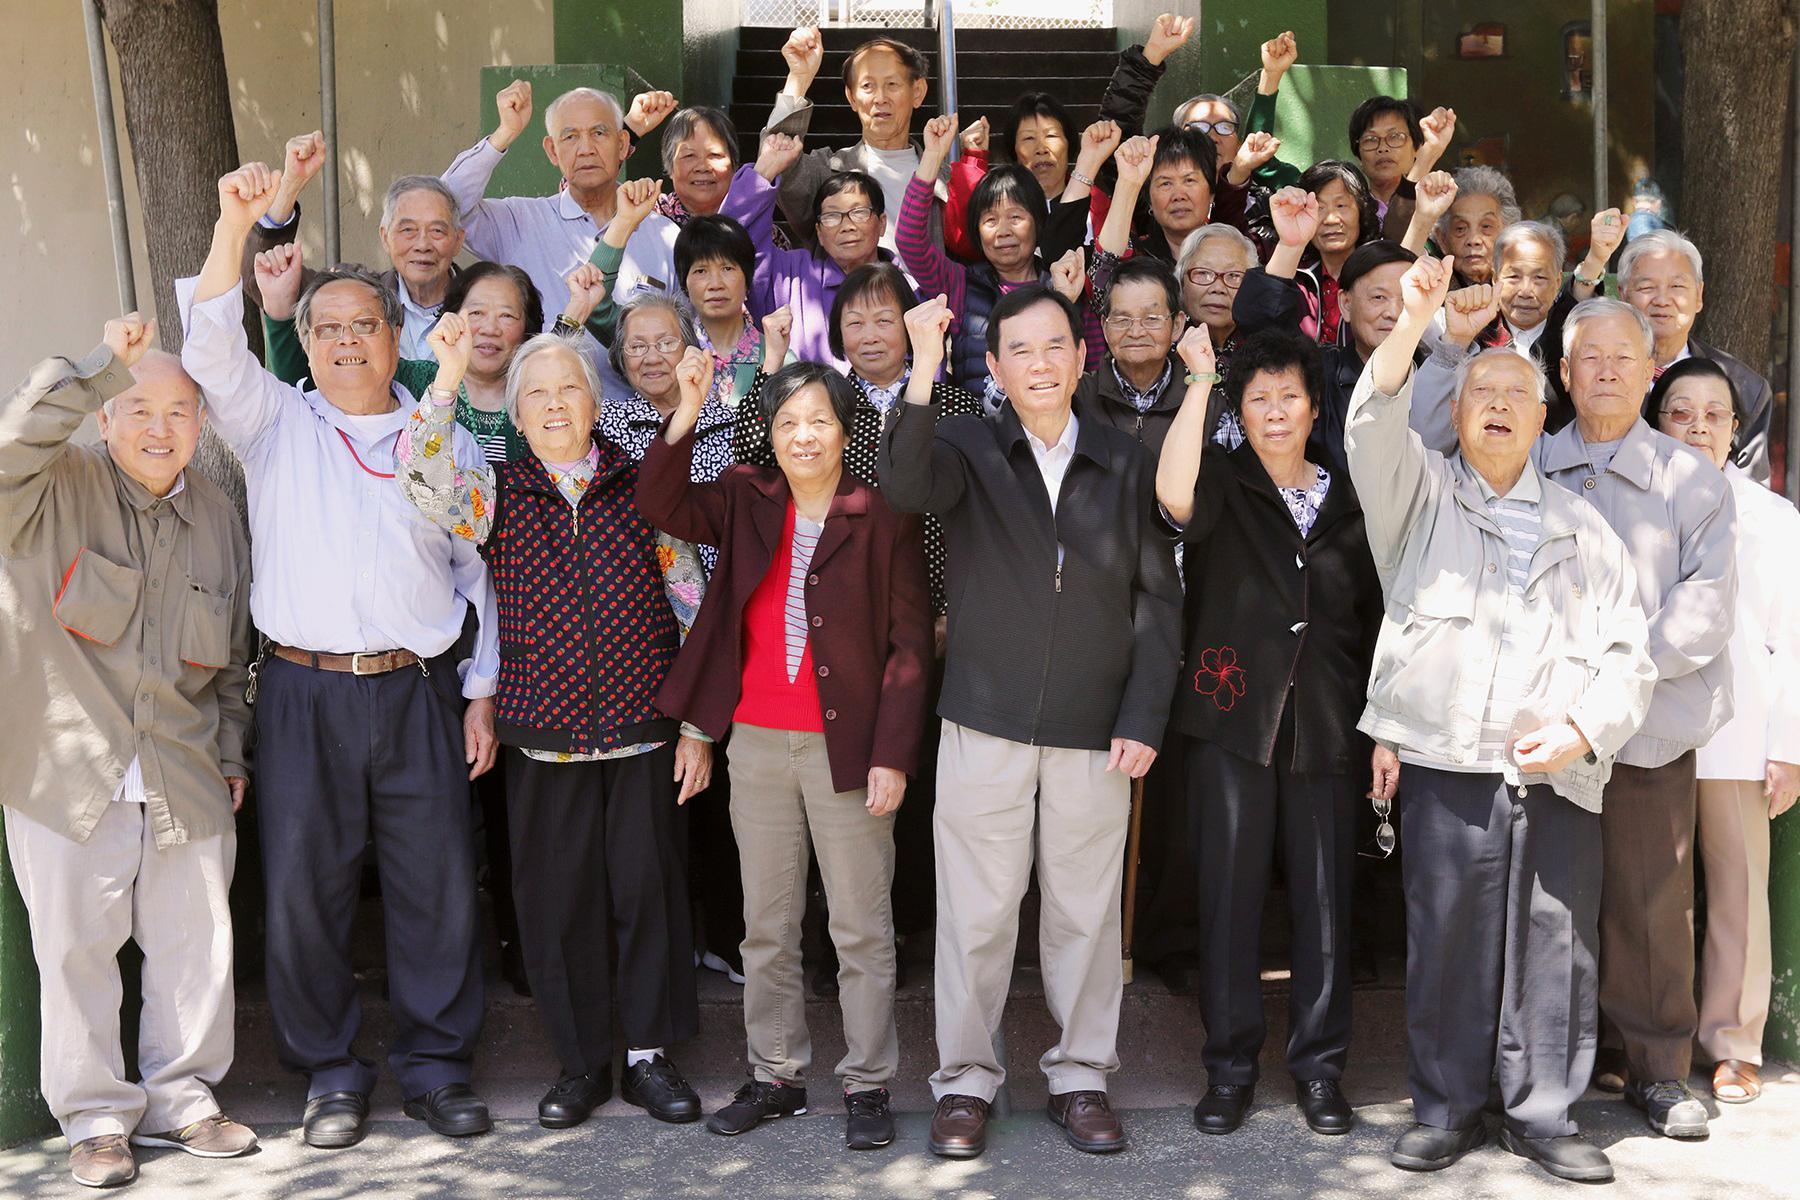 CTA Group Photo copy.jpg